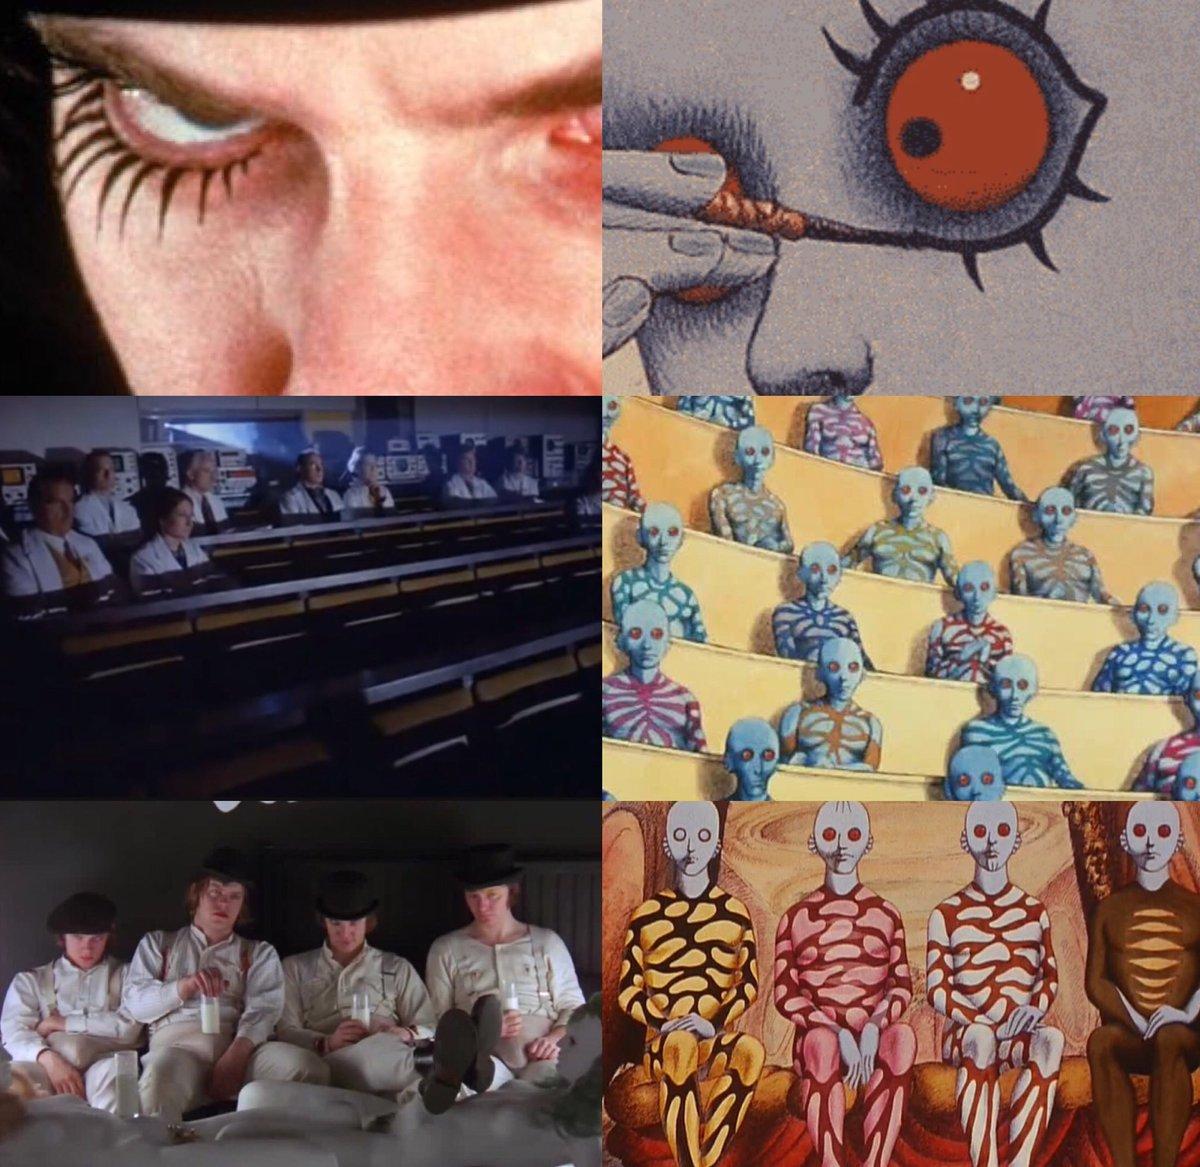 A Clockwork Orange/Fantastic Planet  #sidebyside #stanelykubrick #kubrick #movies #cinema #film #animation #influence #art #malcolmmcdowell<br>http://pic.twitter.com/2HSB8Cf3p4